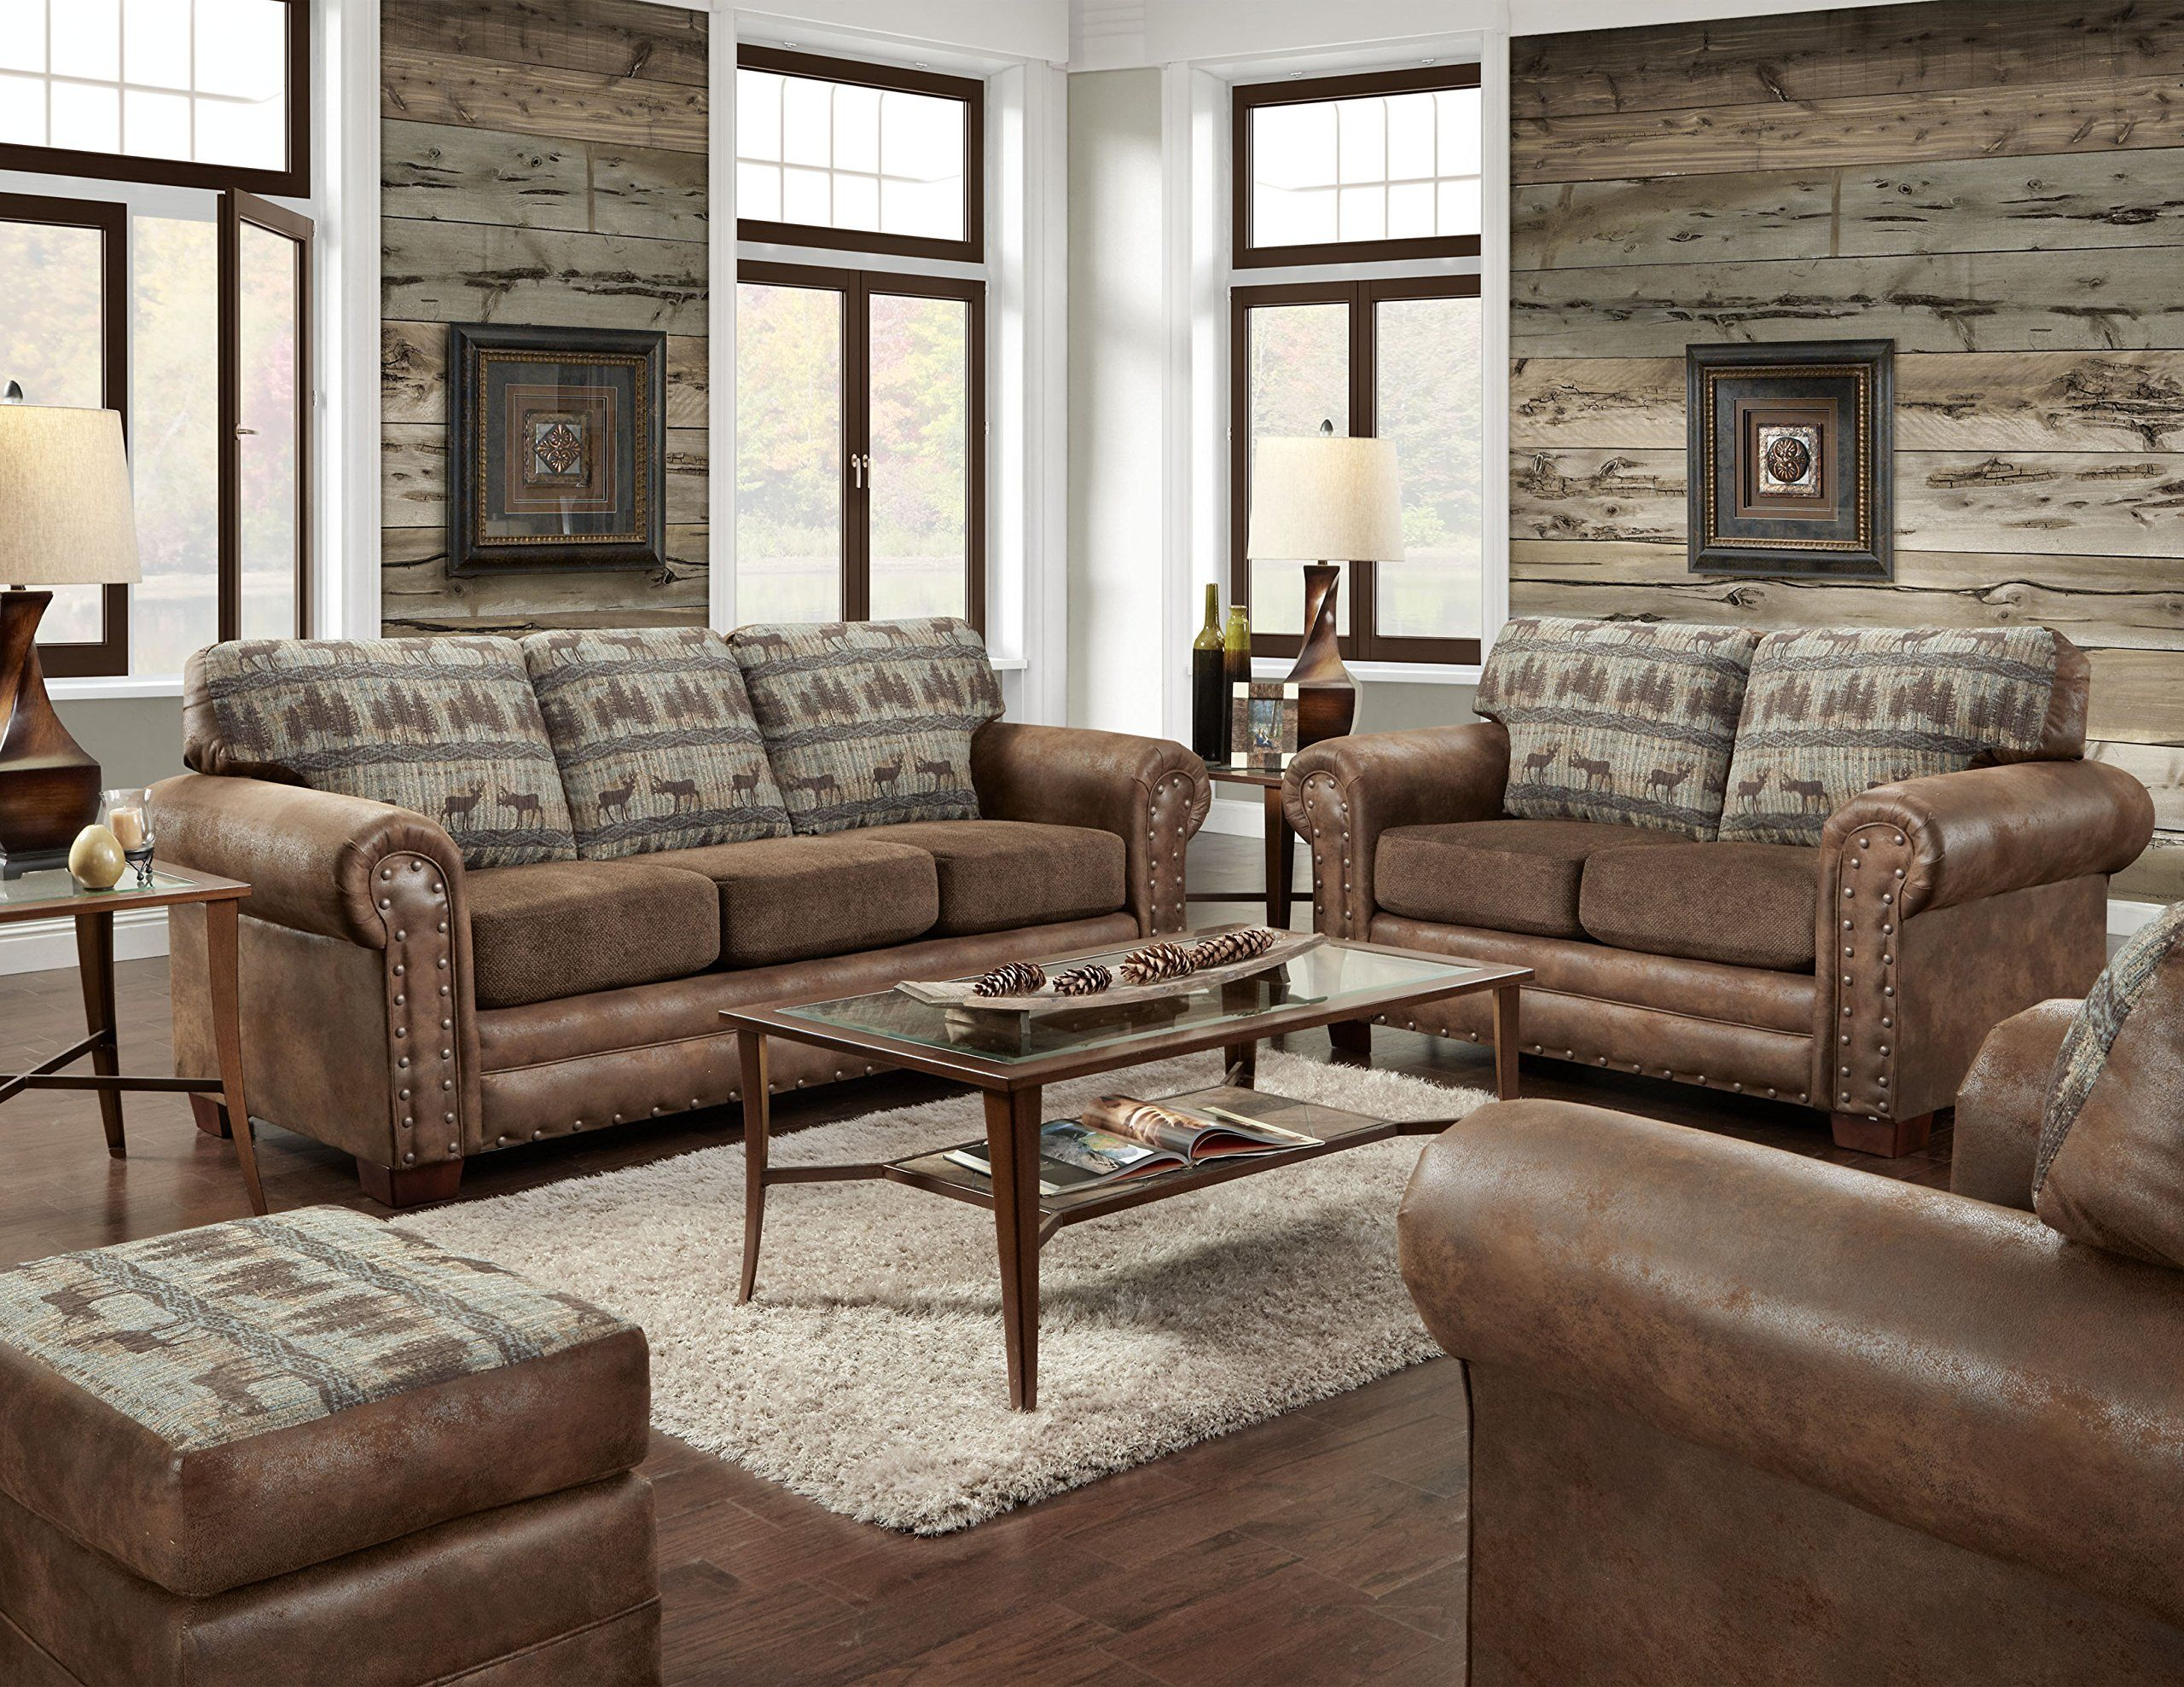 ebay sleeper picture p american sofa s classics horses furniture of wild